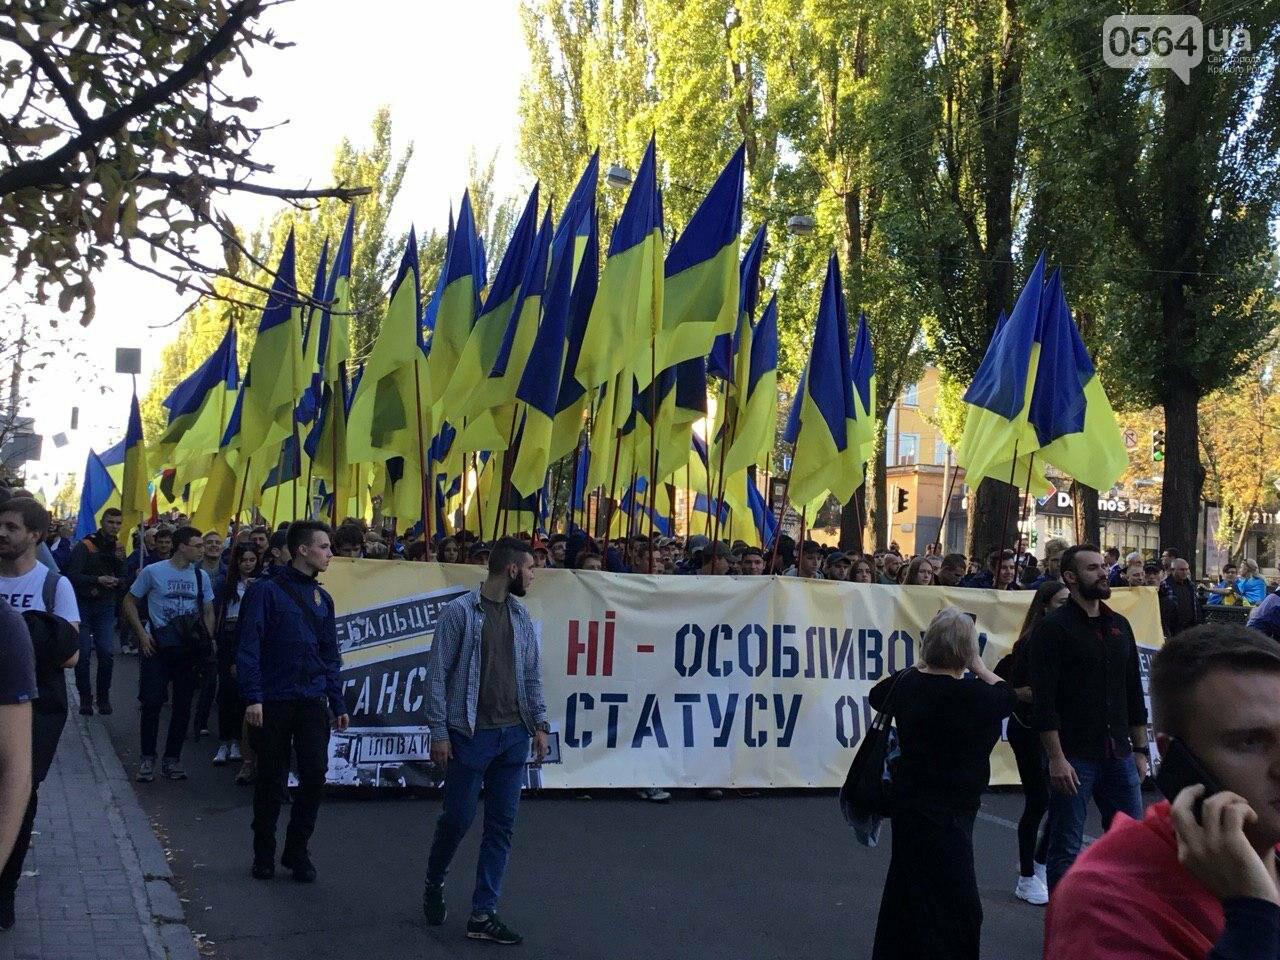 Криворожане поддержали Марш сопротивления капитуляции в Киеве, - ФОТО, ВИДЕО, ОБНОВЛЕНО, фото-15